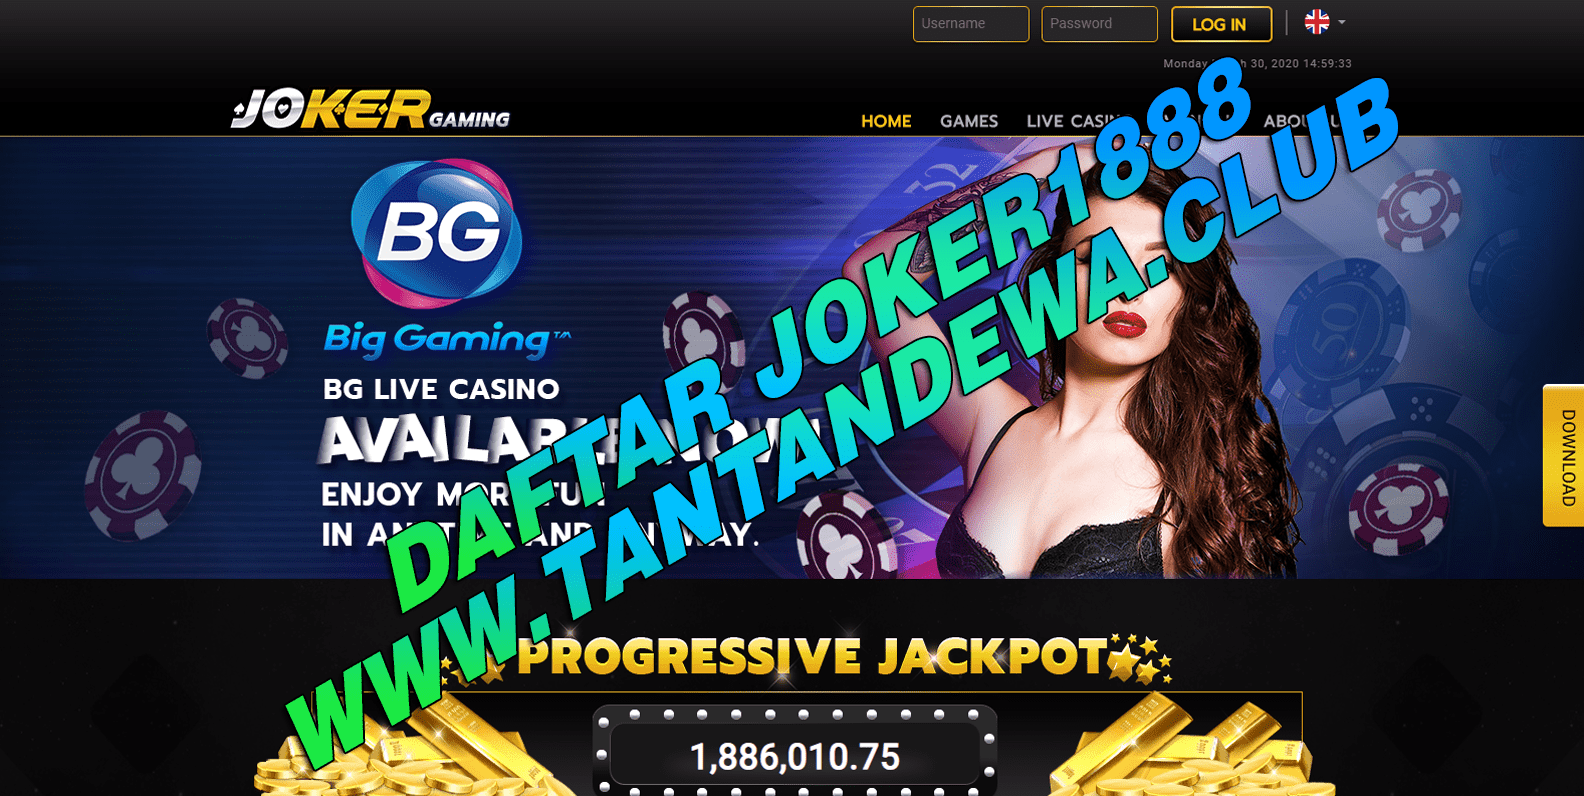 Joker1888, Live casino joker1888, download apk joker, deposit via ovo, link joker1888, situs joker1888, login joker1888, daftar joker1888, wa joker, livechat joker, situs slot joker1888,